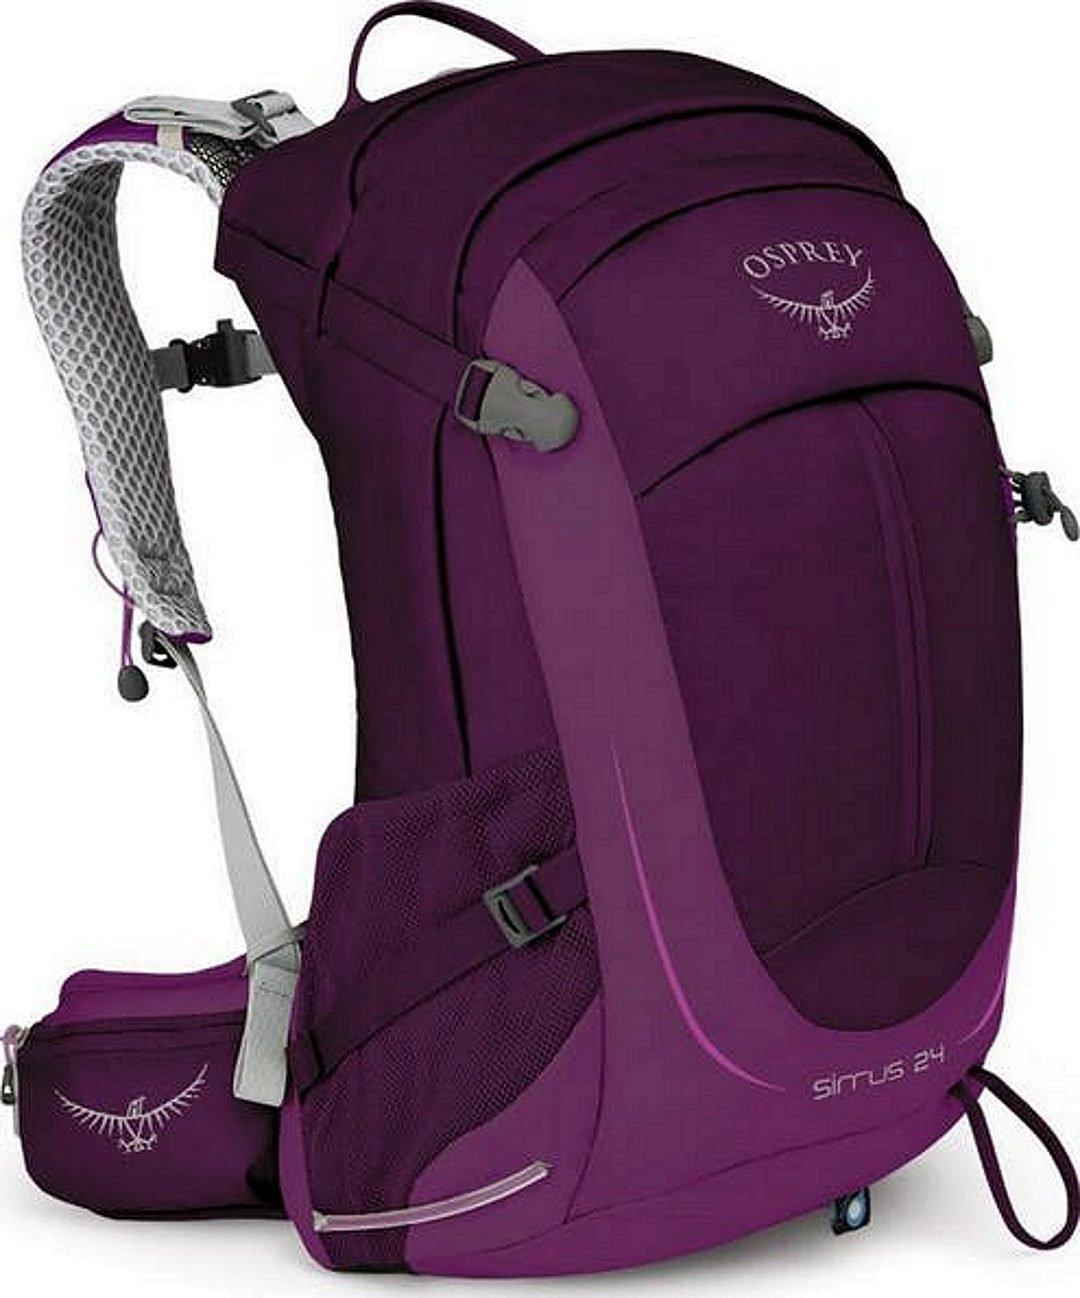 Osprey Sirrus 24 Daypack